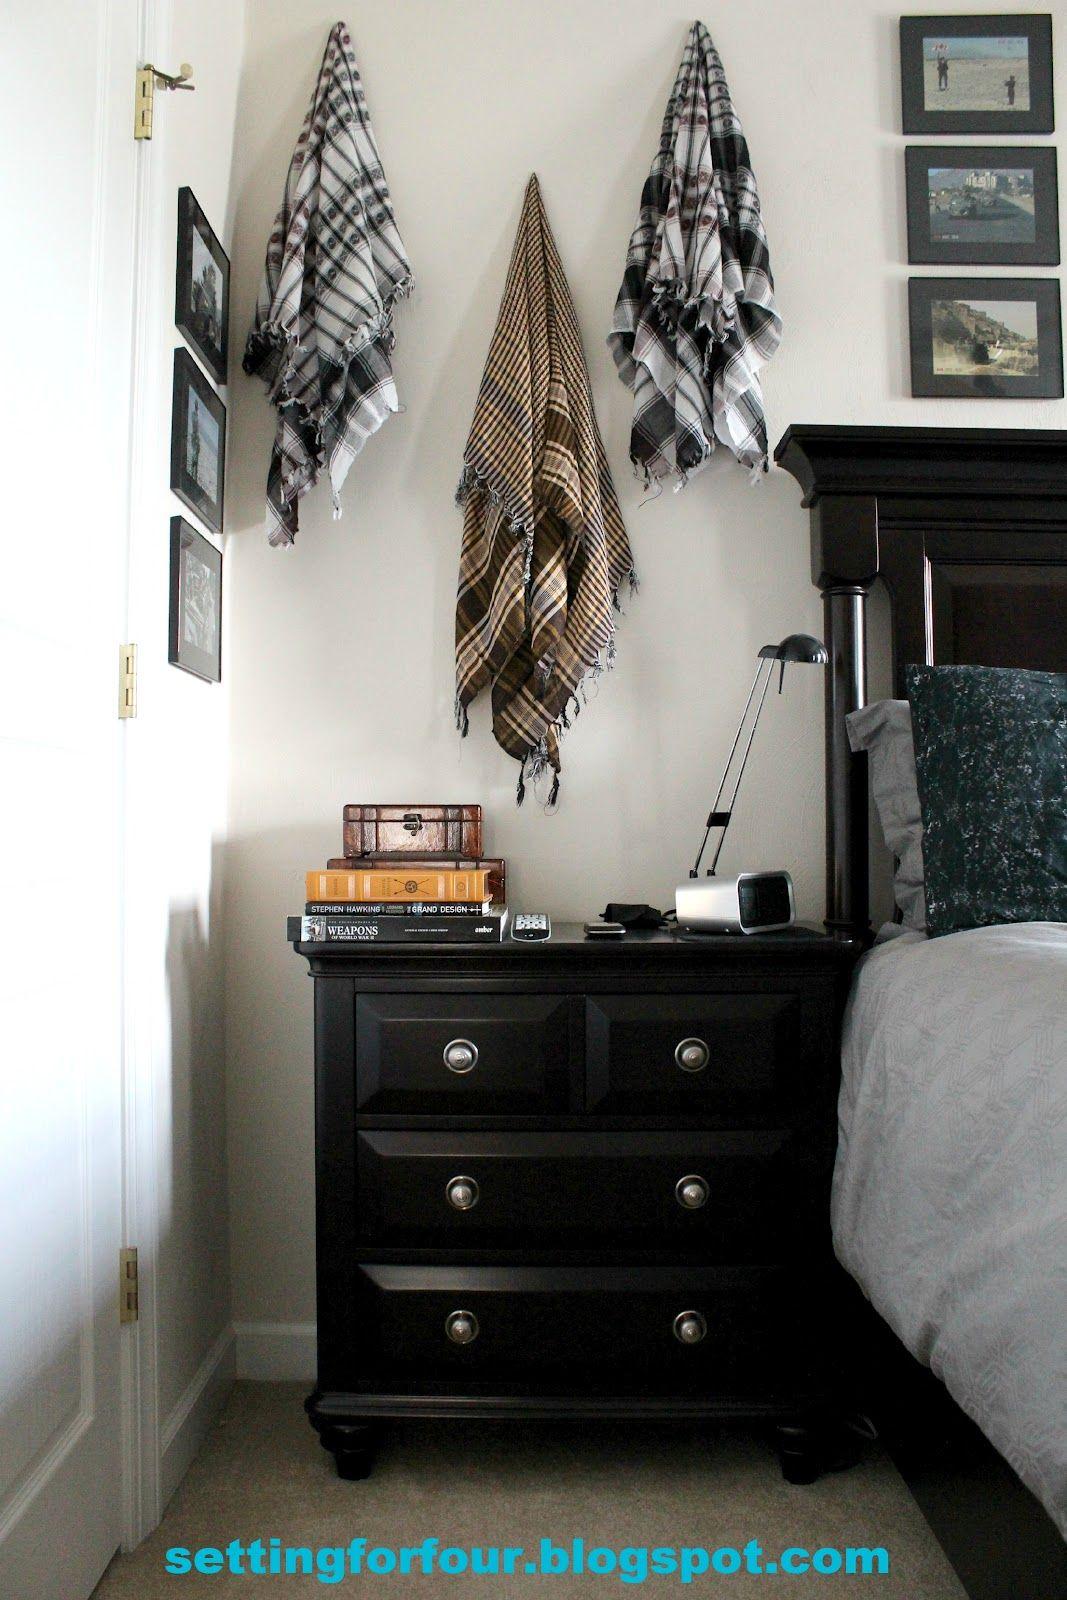 teenage furniture ideas. Beautiful Furniture Teen Boyu0027s Bedroom Decor Tips Including Wall Art Ideas Storage  Bedding And Furniture And Teenage Furniture Ideas E